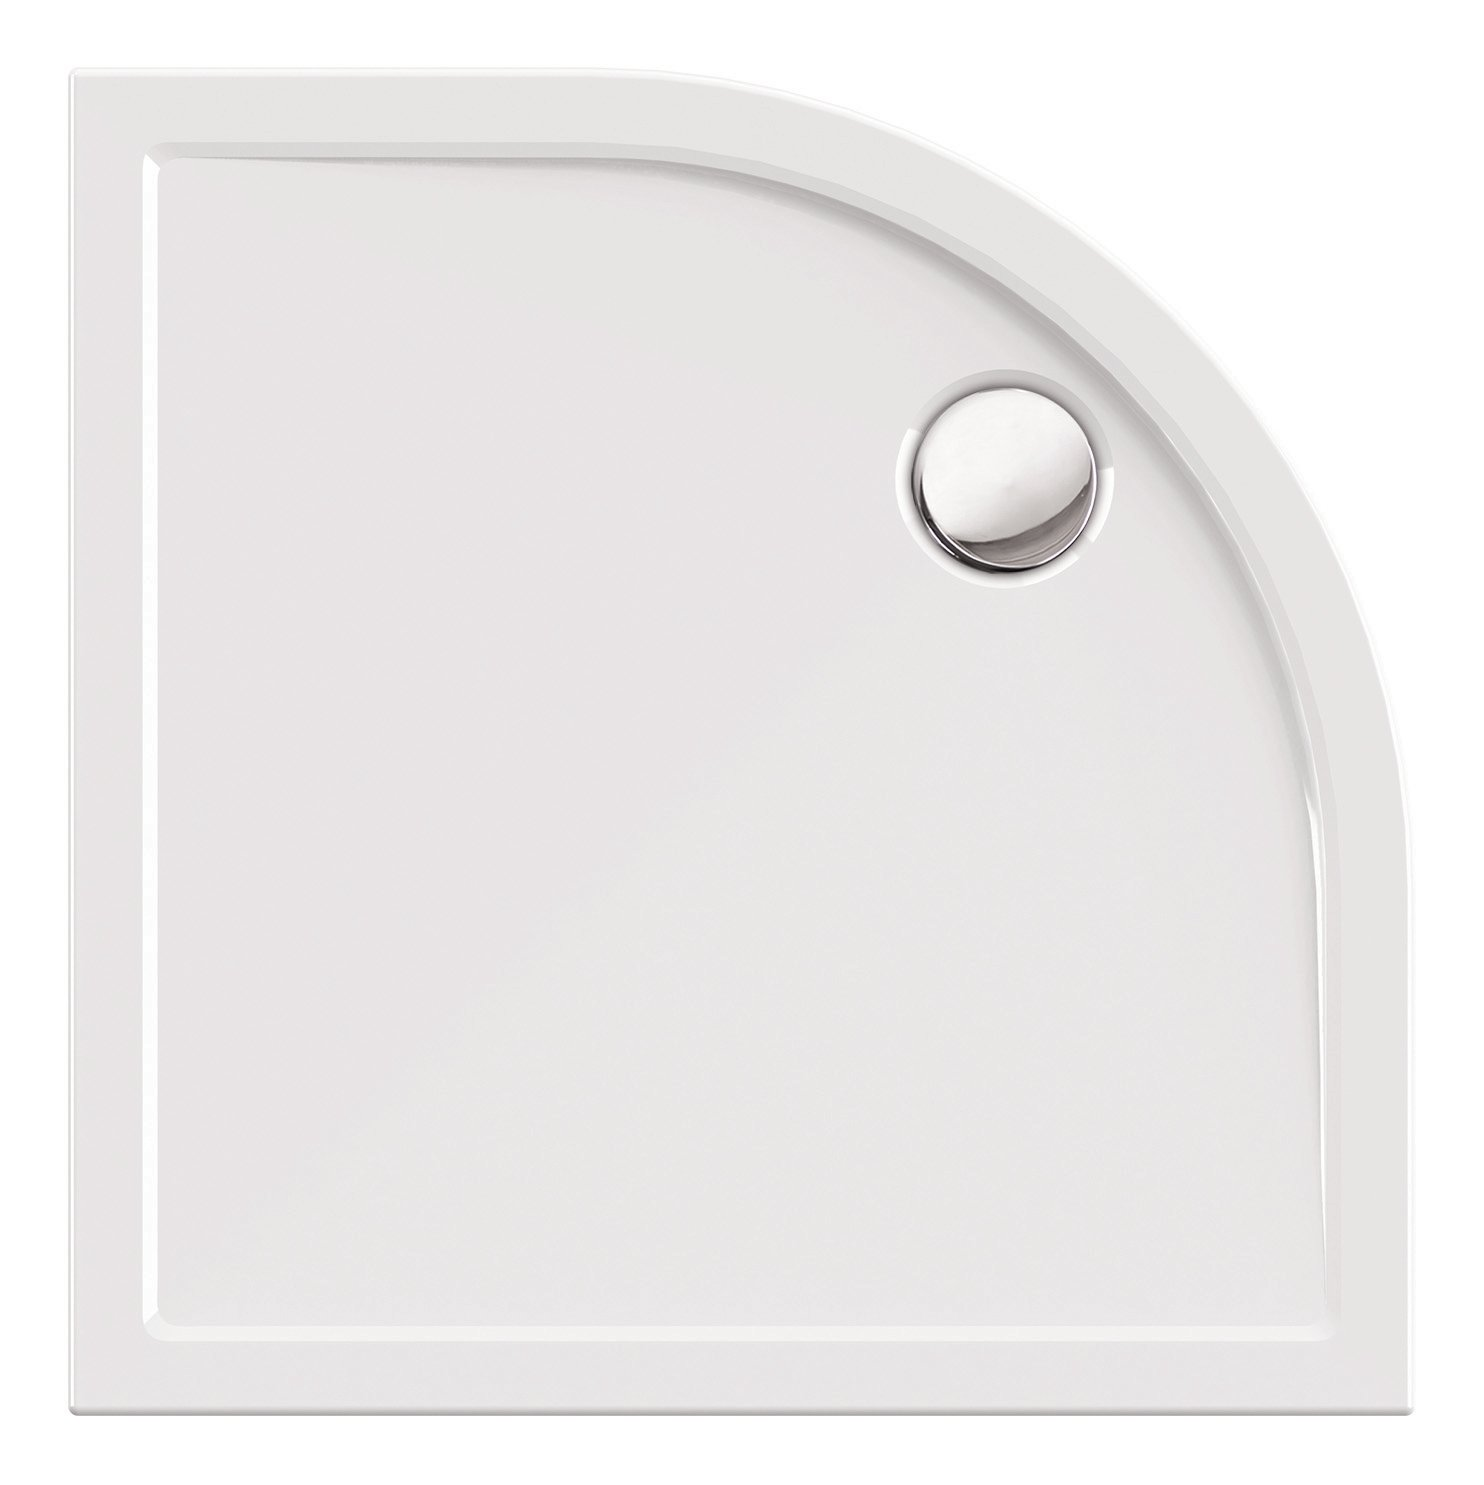 AquaSu 80221 5 Acryl-Dusch-Wanne tEso Round, 90 x 90 cm, Weiß, Duschwanne, Brausewanne, Bad, Badezimmer, 90 x 90 x 2,5 cm